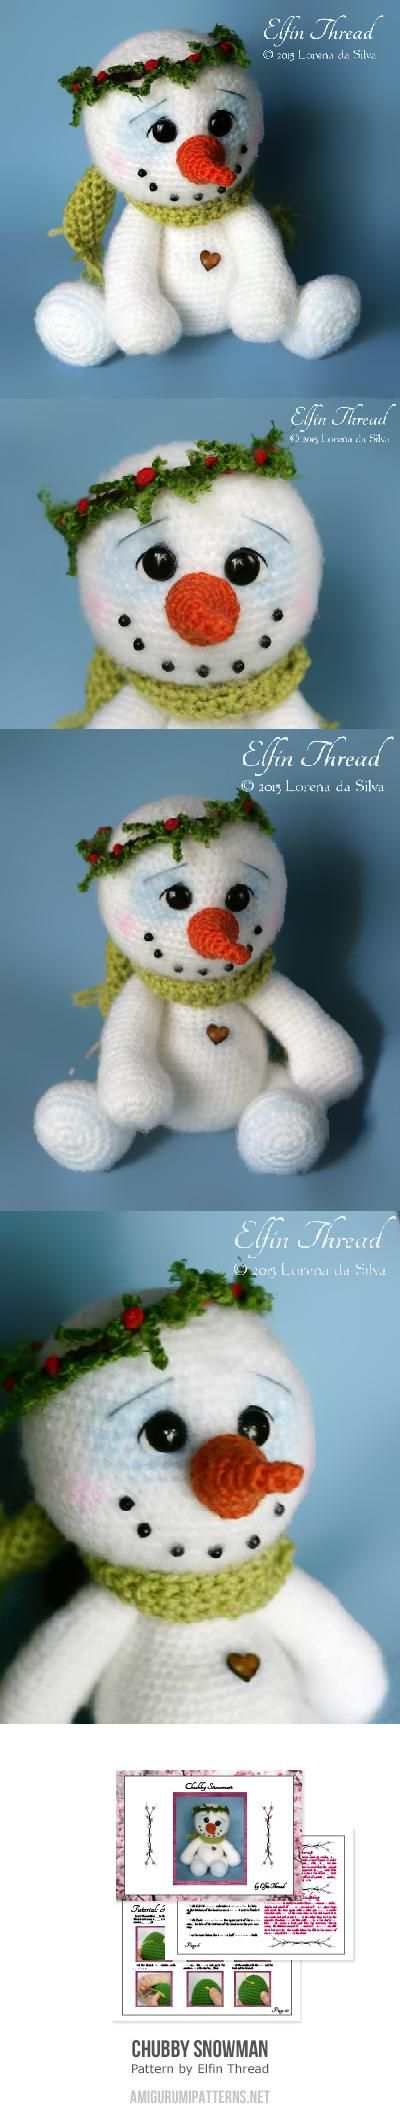 Chubby Snowman Amigurumi Pattern